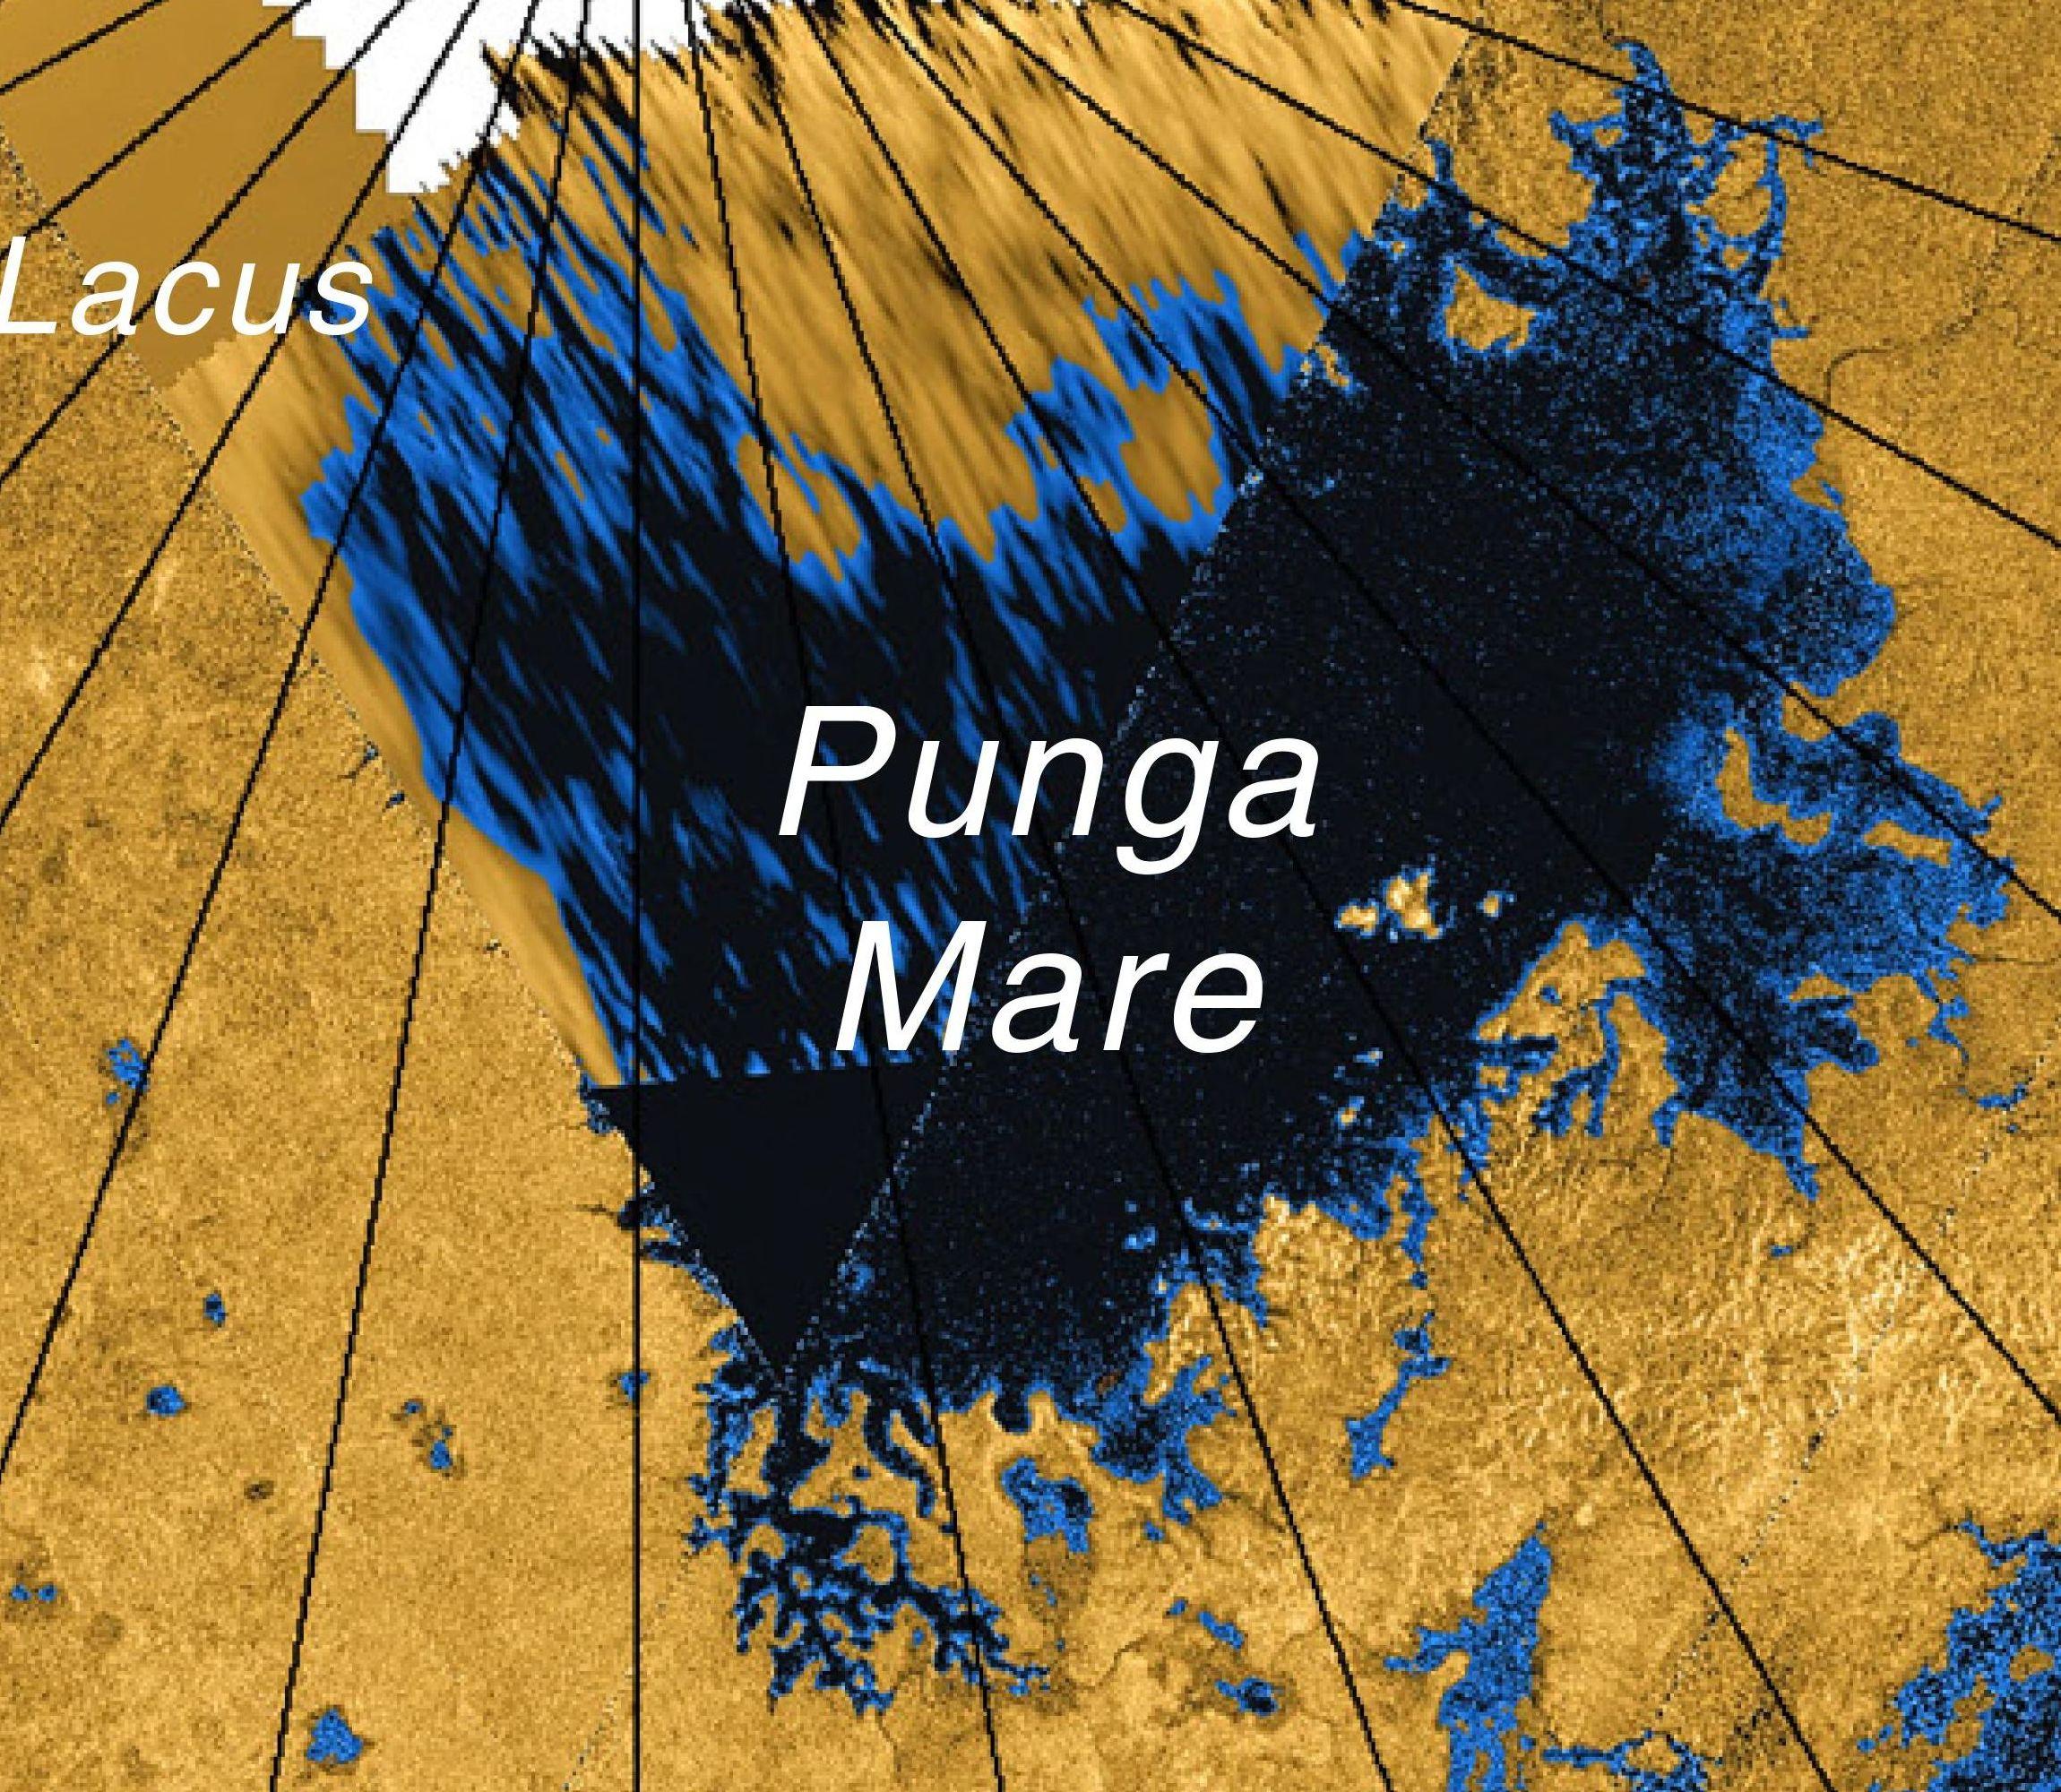 File Pia17655 Punga Mare Crop Jpg Wikimedia Commons